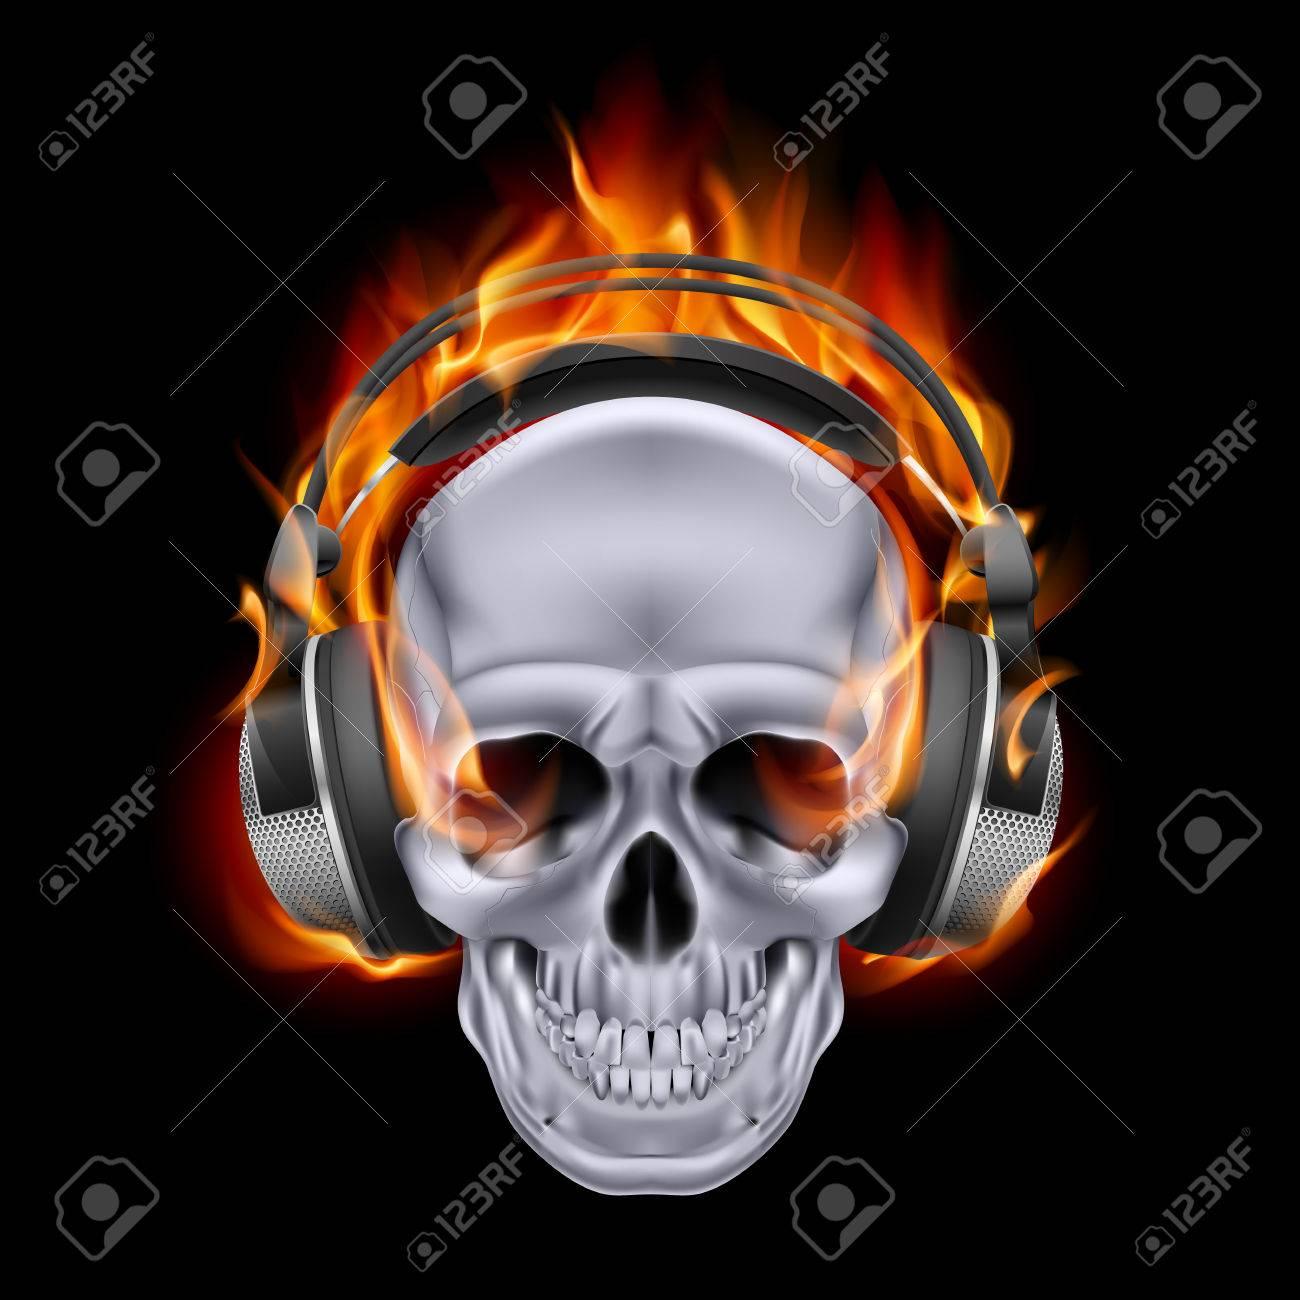 Flaming skull in headphones on black background. Stock Vector - 24680205